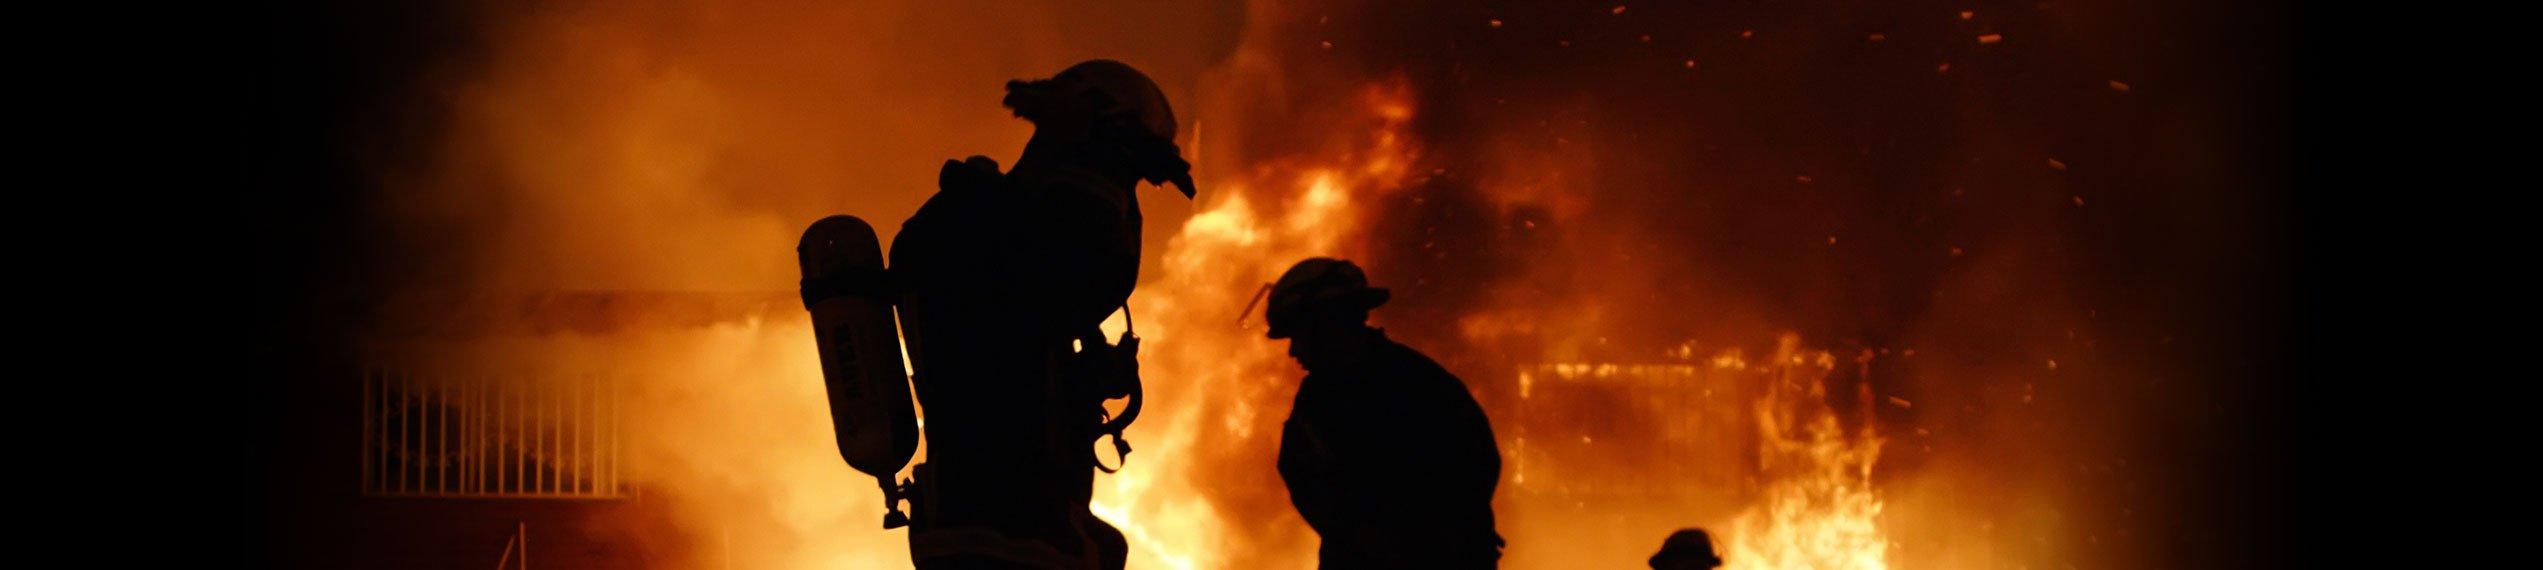 Fire & Smoke Damage Removal in Paul Davis Restoration of Suburban MD Washington DC